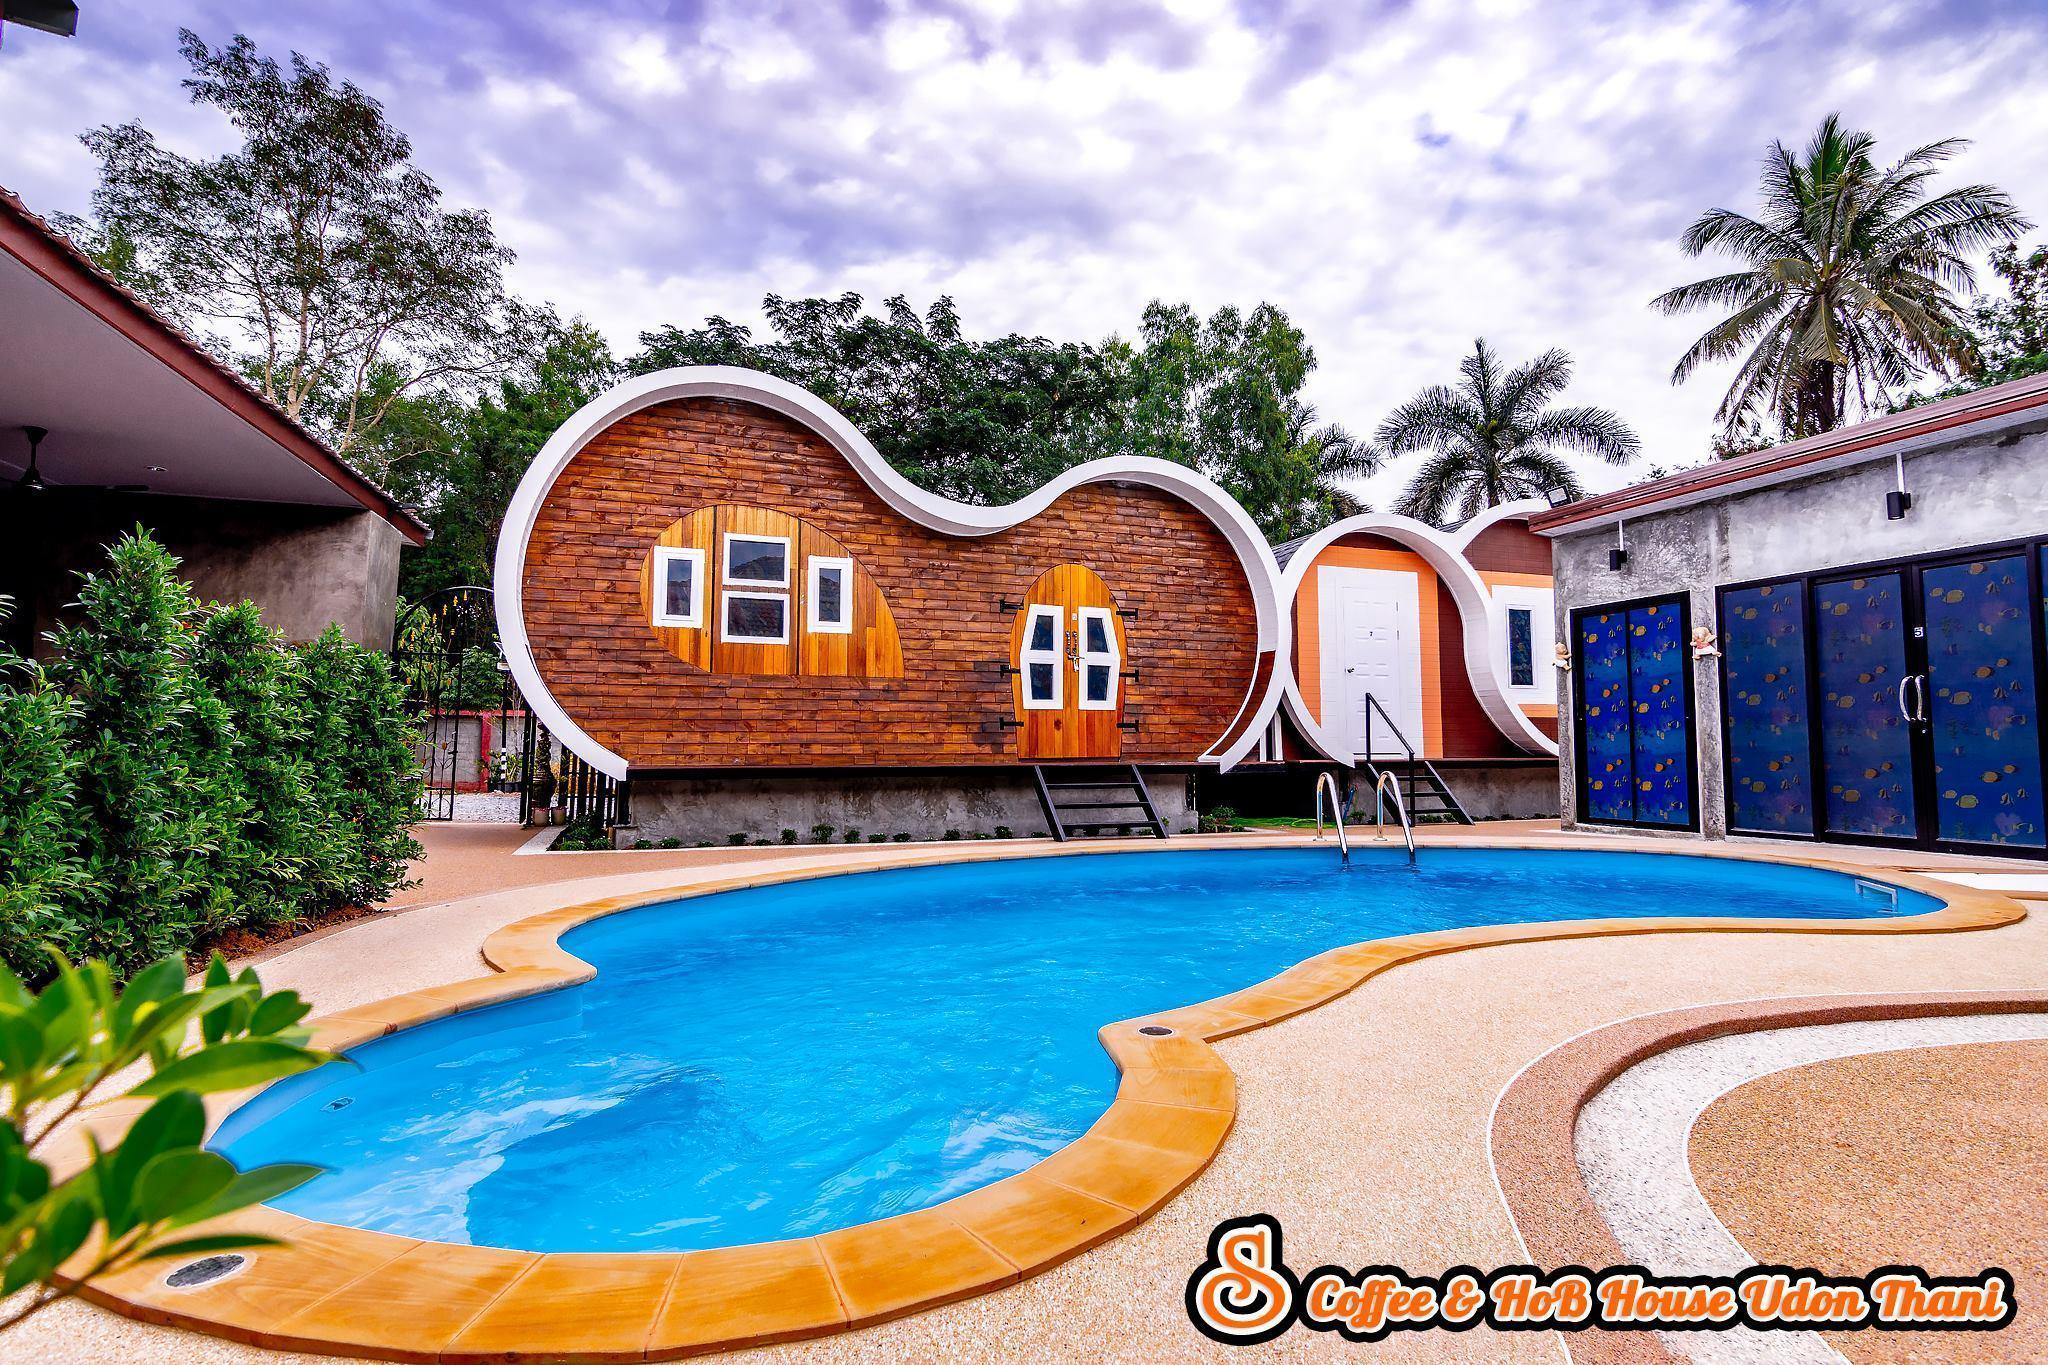 S Coffee & HoB House Udon Thani วิลลา 1 ห้องนอน 8 ห้องน้ำส่วนตัว ขนาด 4 ตร.ม. – อำเภอเมือง